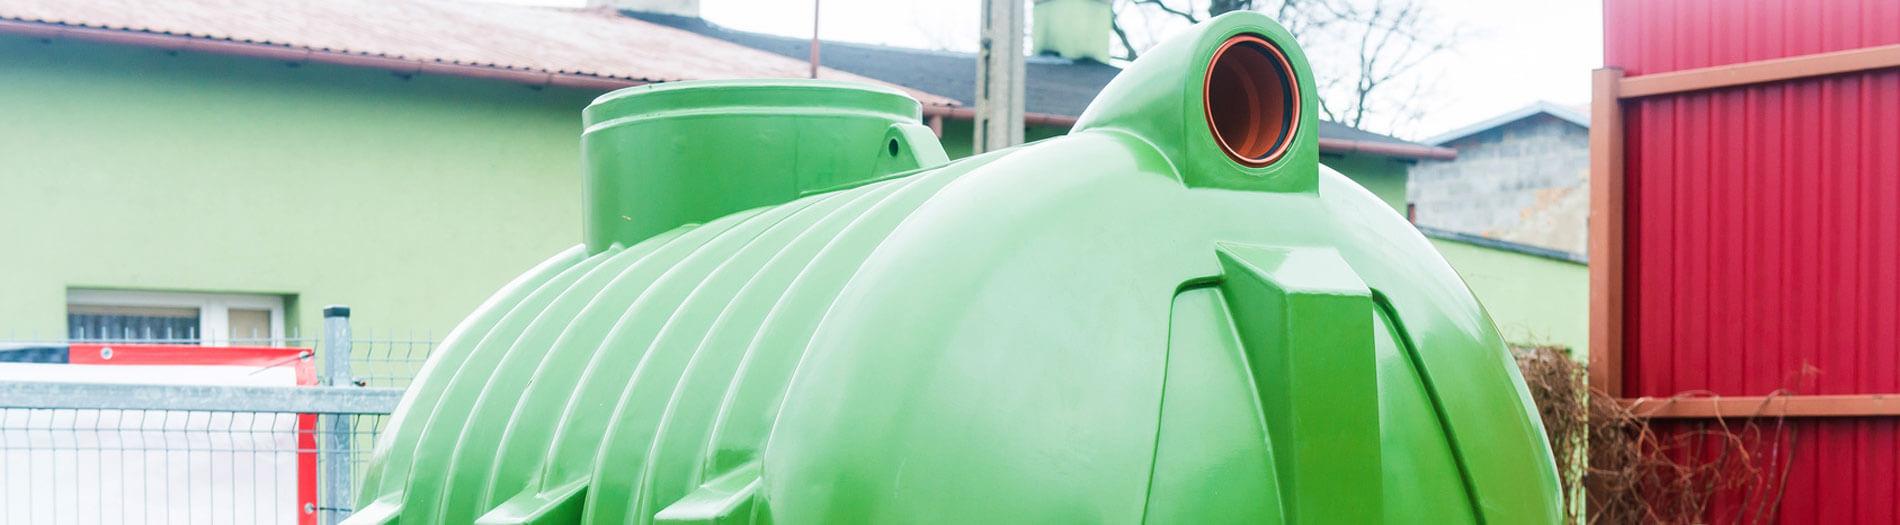 Green Septic Tank